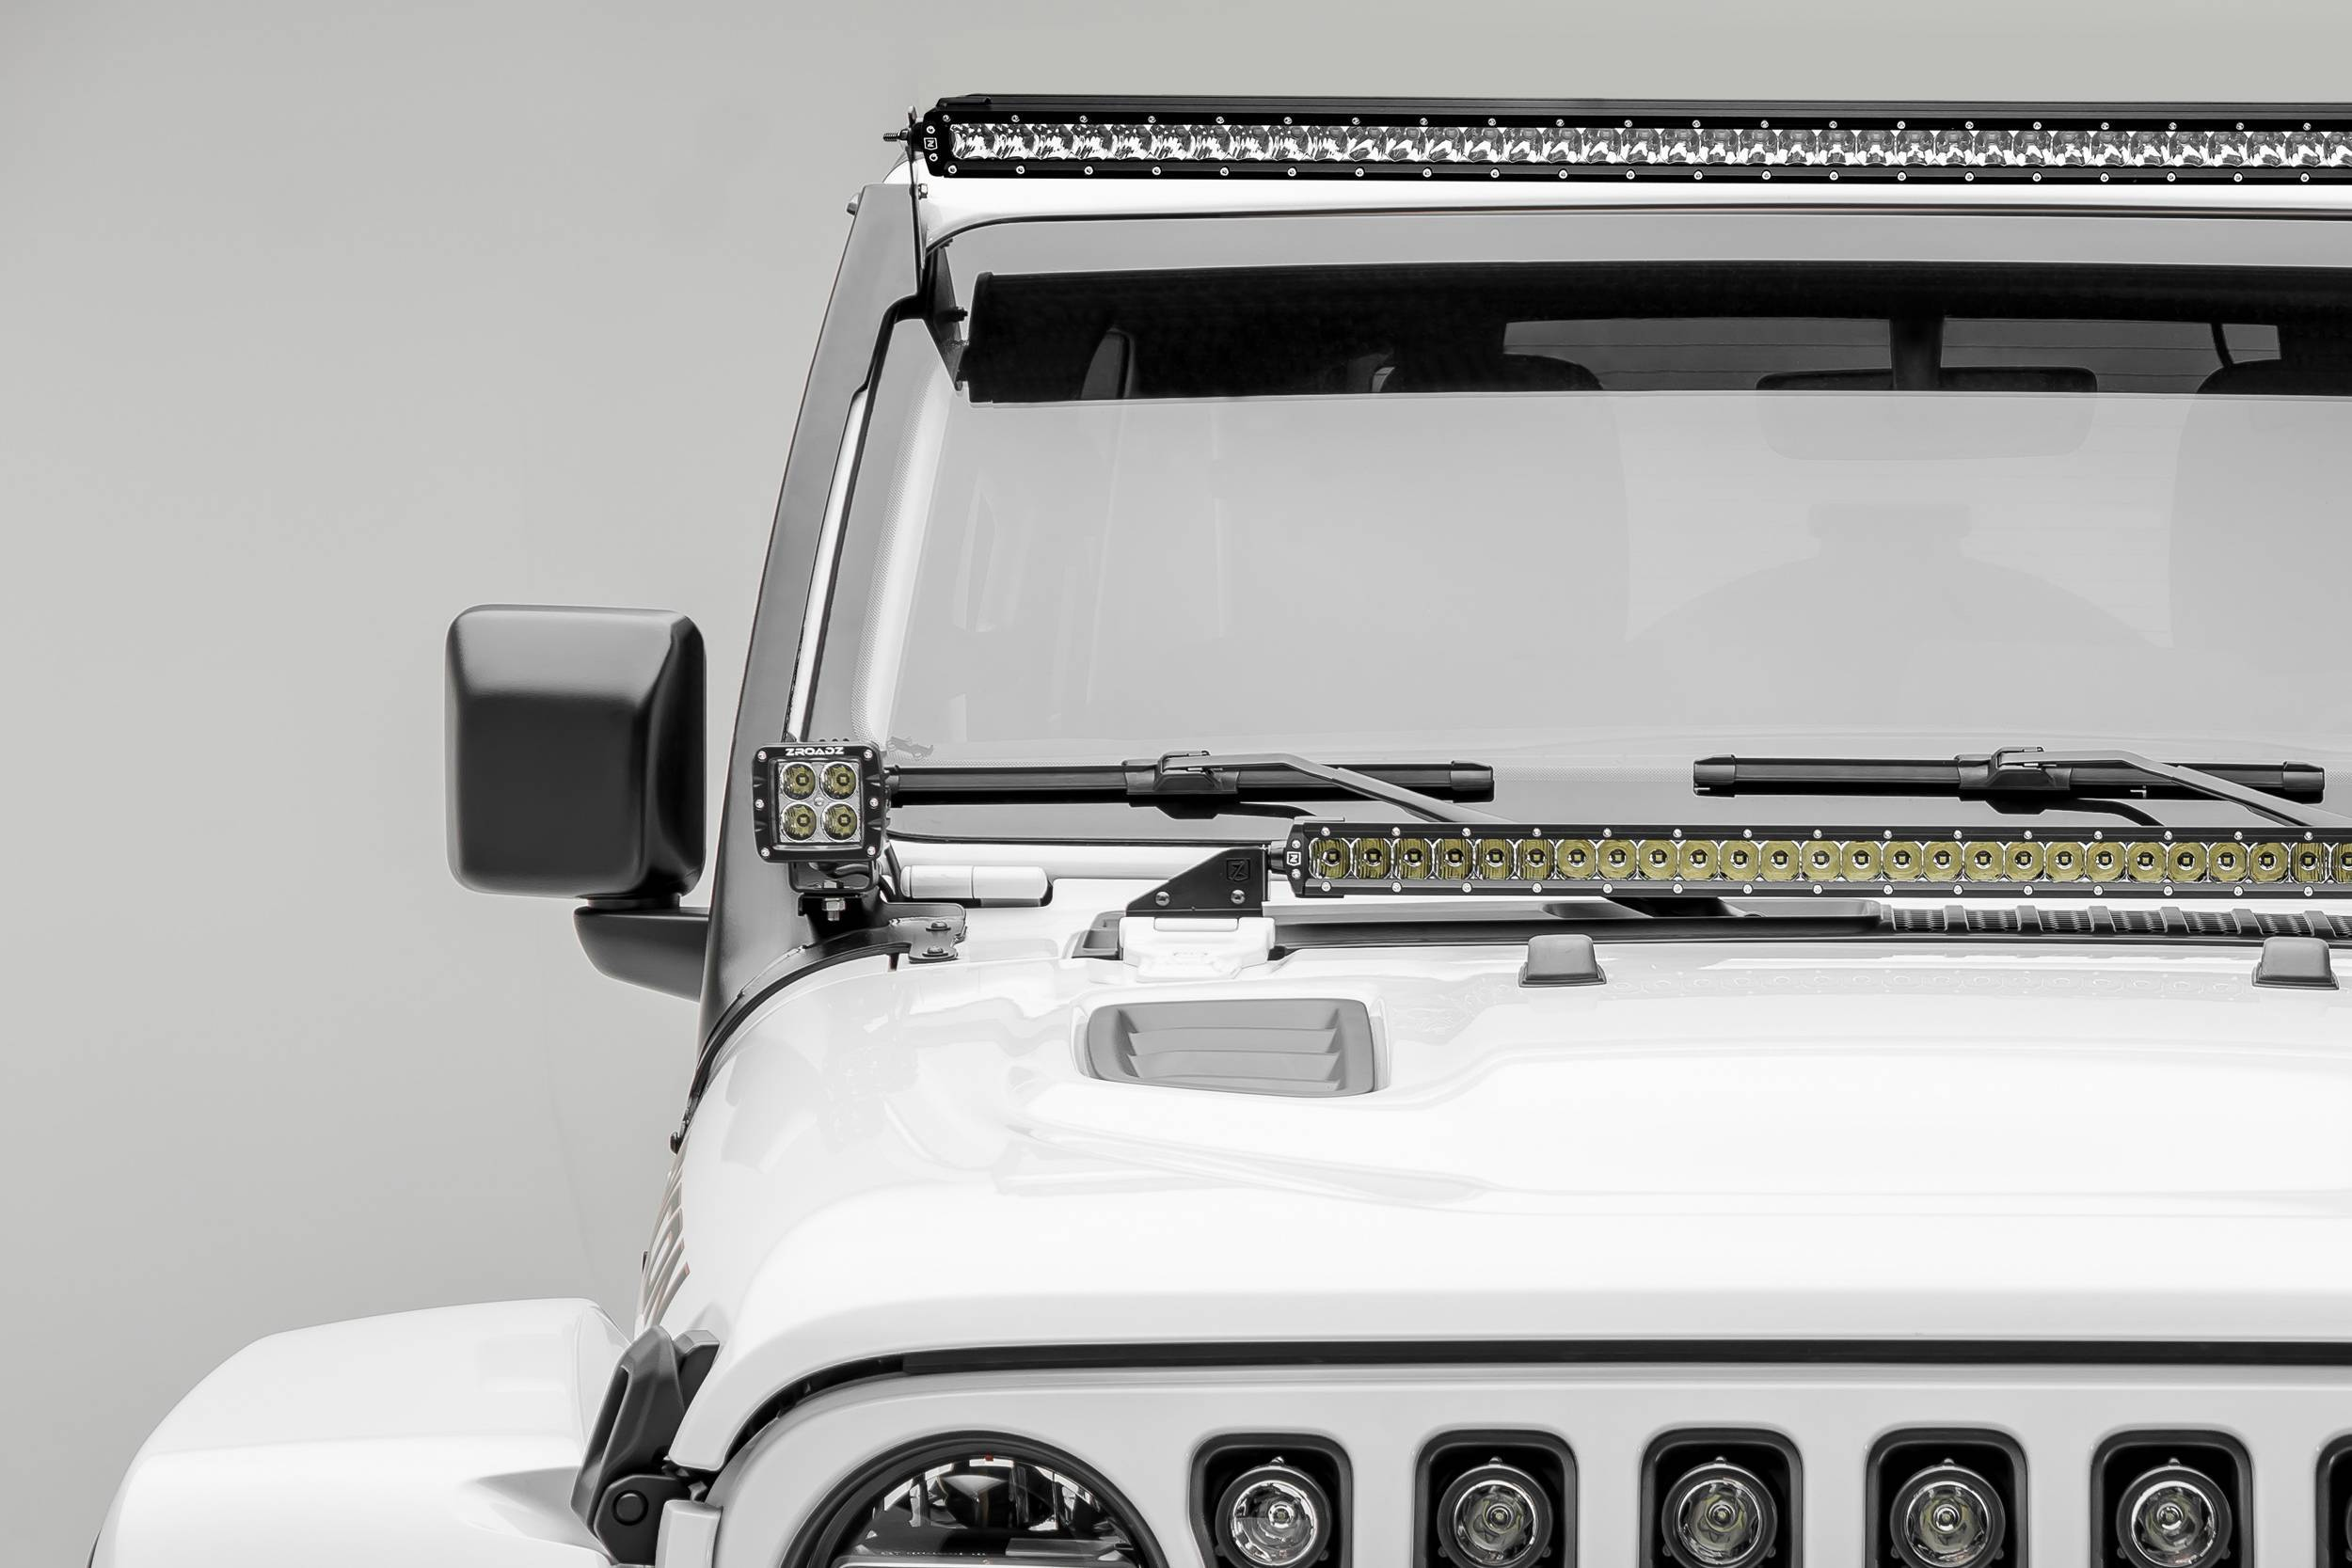 ZROADZ - Jeep JL, Gladiator Front Roof LED Kit with (1) 50 Inch LED Straight Single Row Slim Light Bar and (2) 3 Inch LED Pod Lights - PN #Z374831-KIT2S